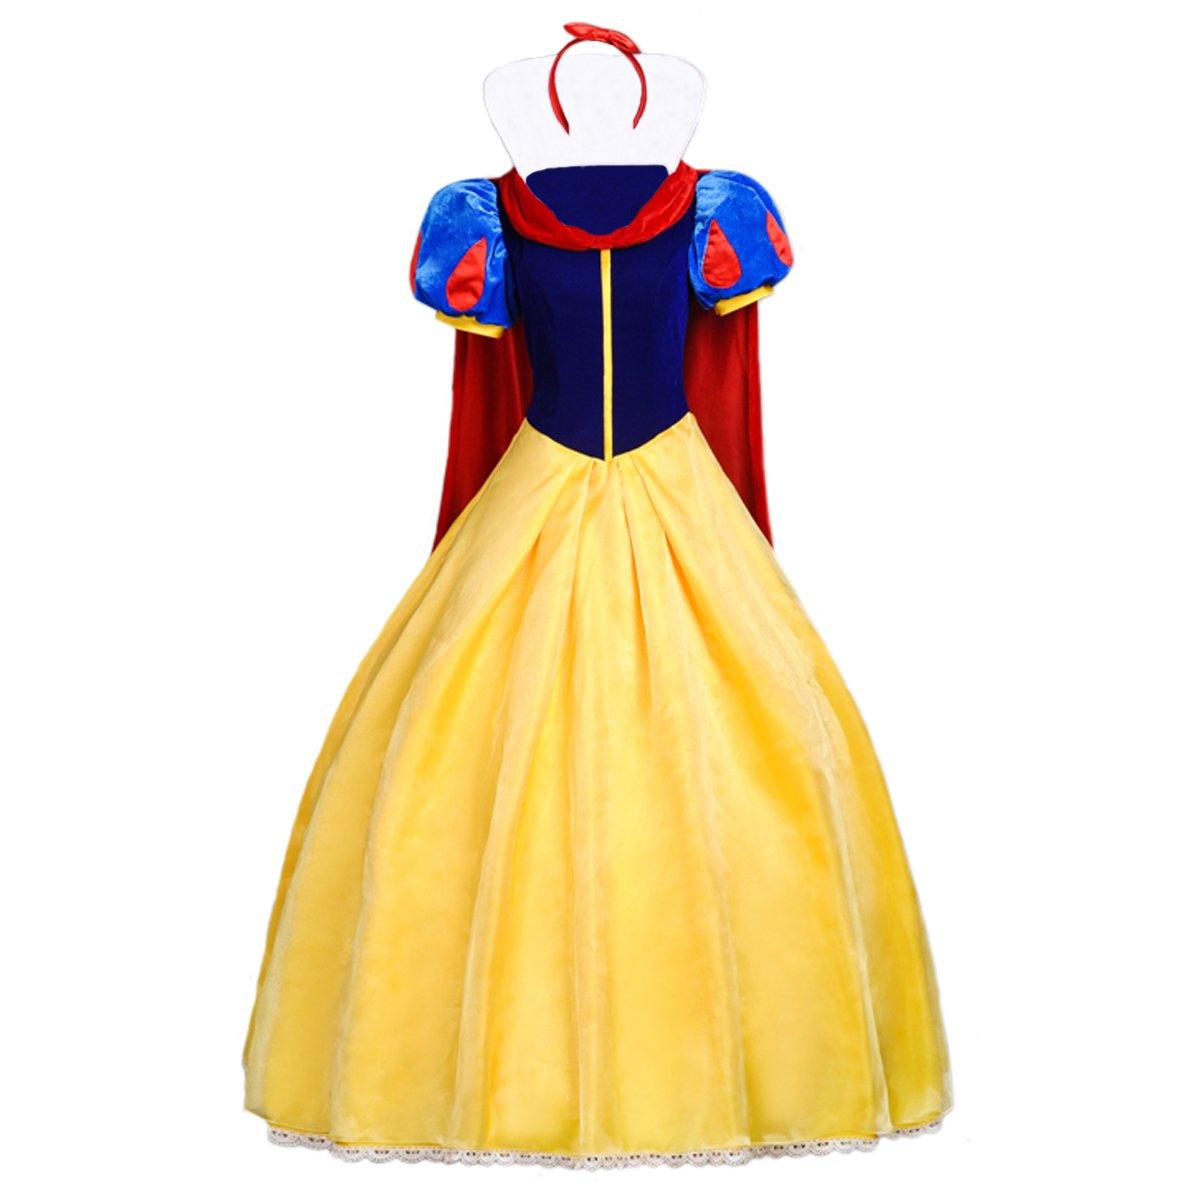 Angelaicos Womens Princess Costume Dress Cloak Headband (L, Yellow Red) by Angelaicos